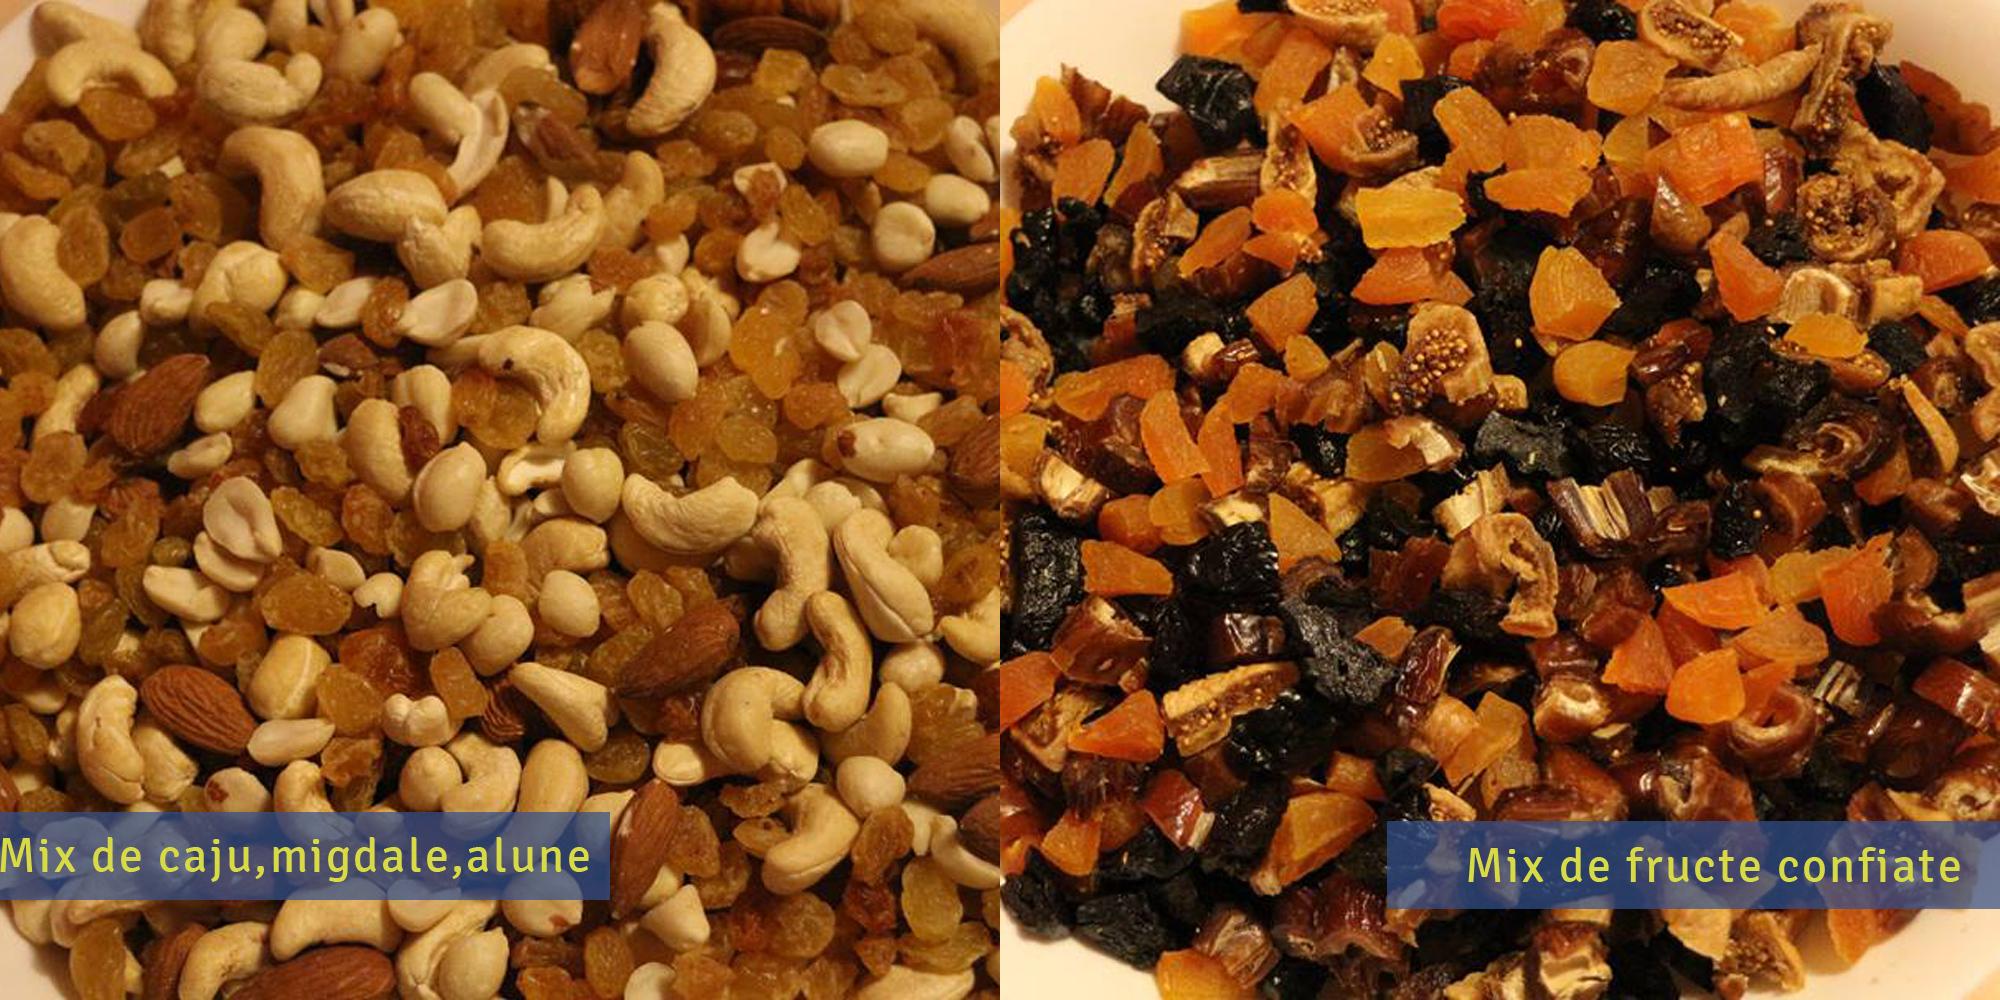 mix de fructe confiate seminte si alune